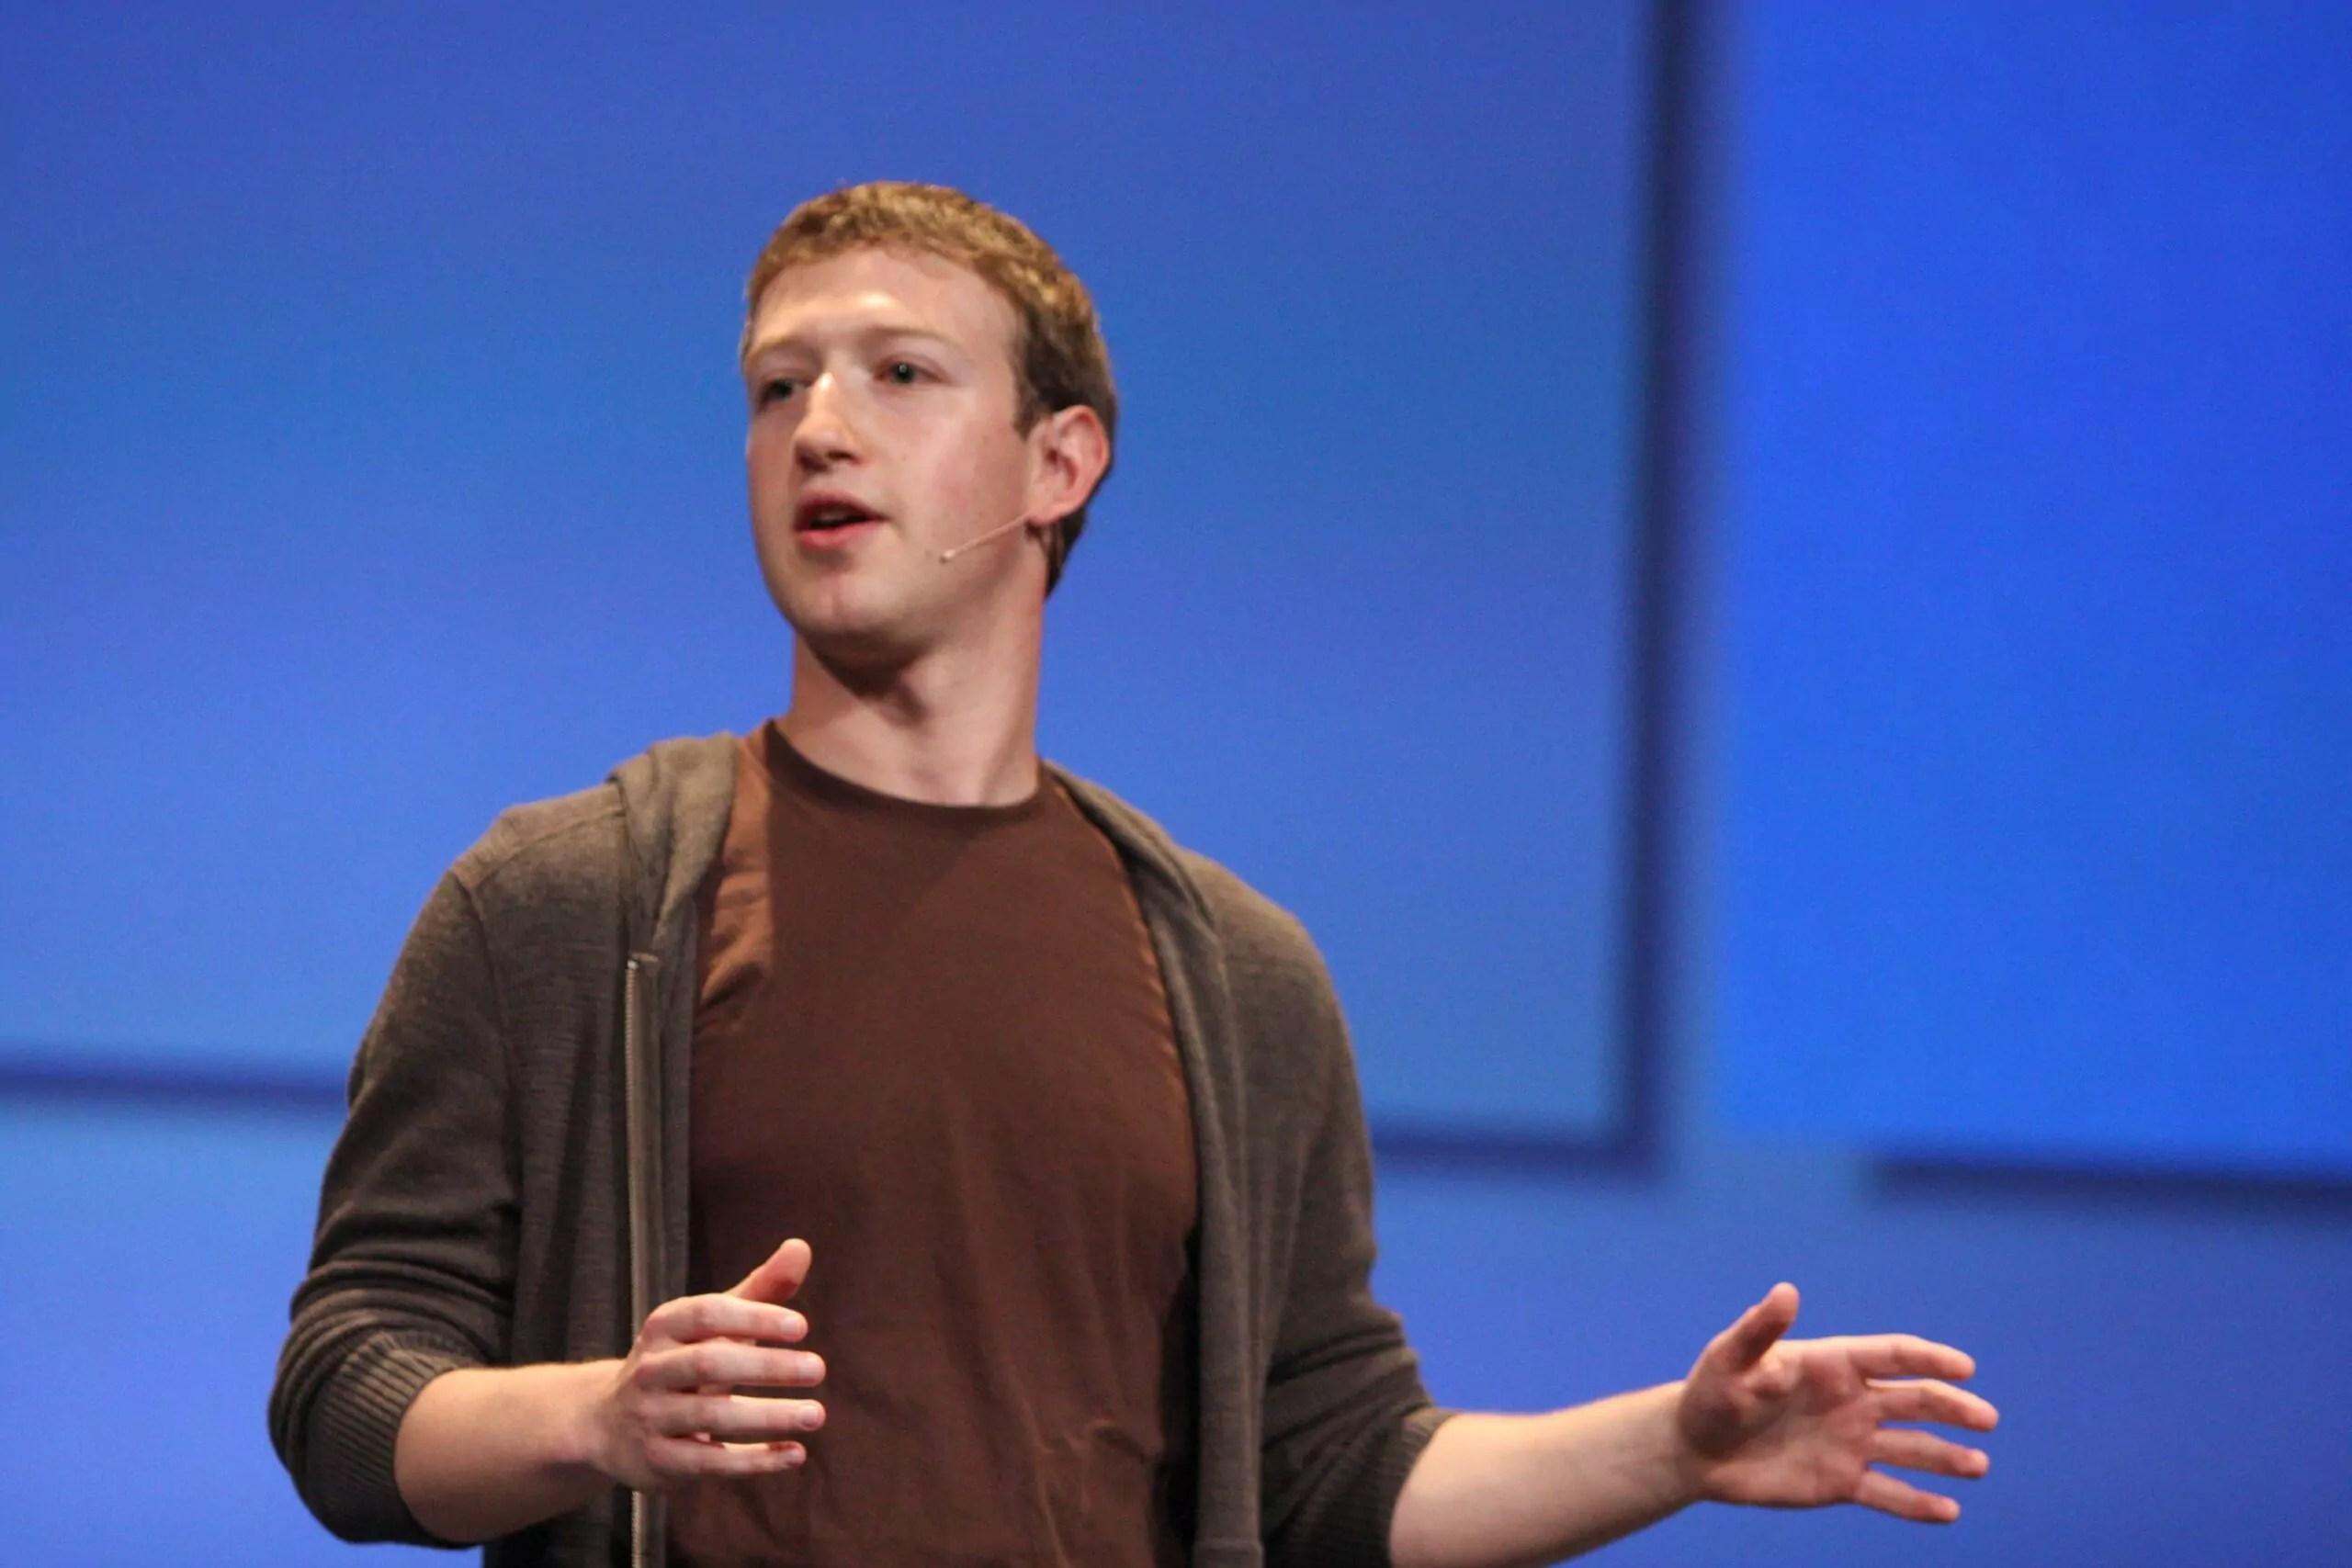 Zuckerberg anuncia que Facebook irá doar 40 milhões de dólares